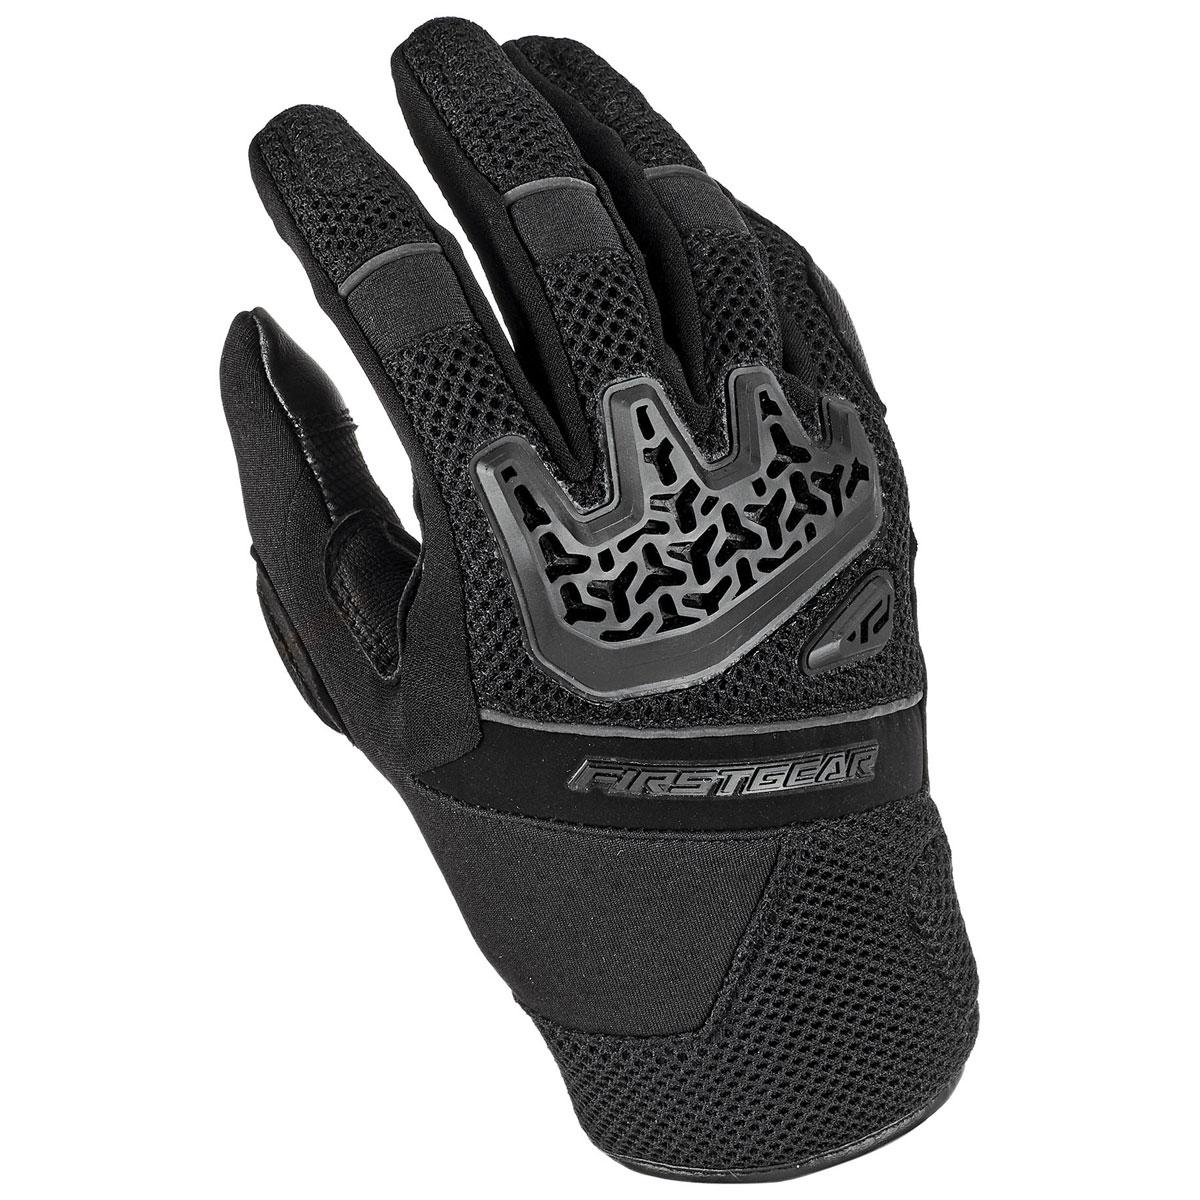 Firstgear Men's Airspeed Mesh Black Gloves